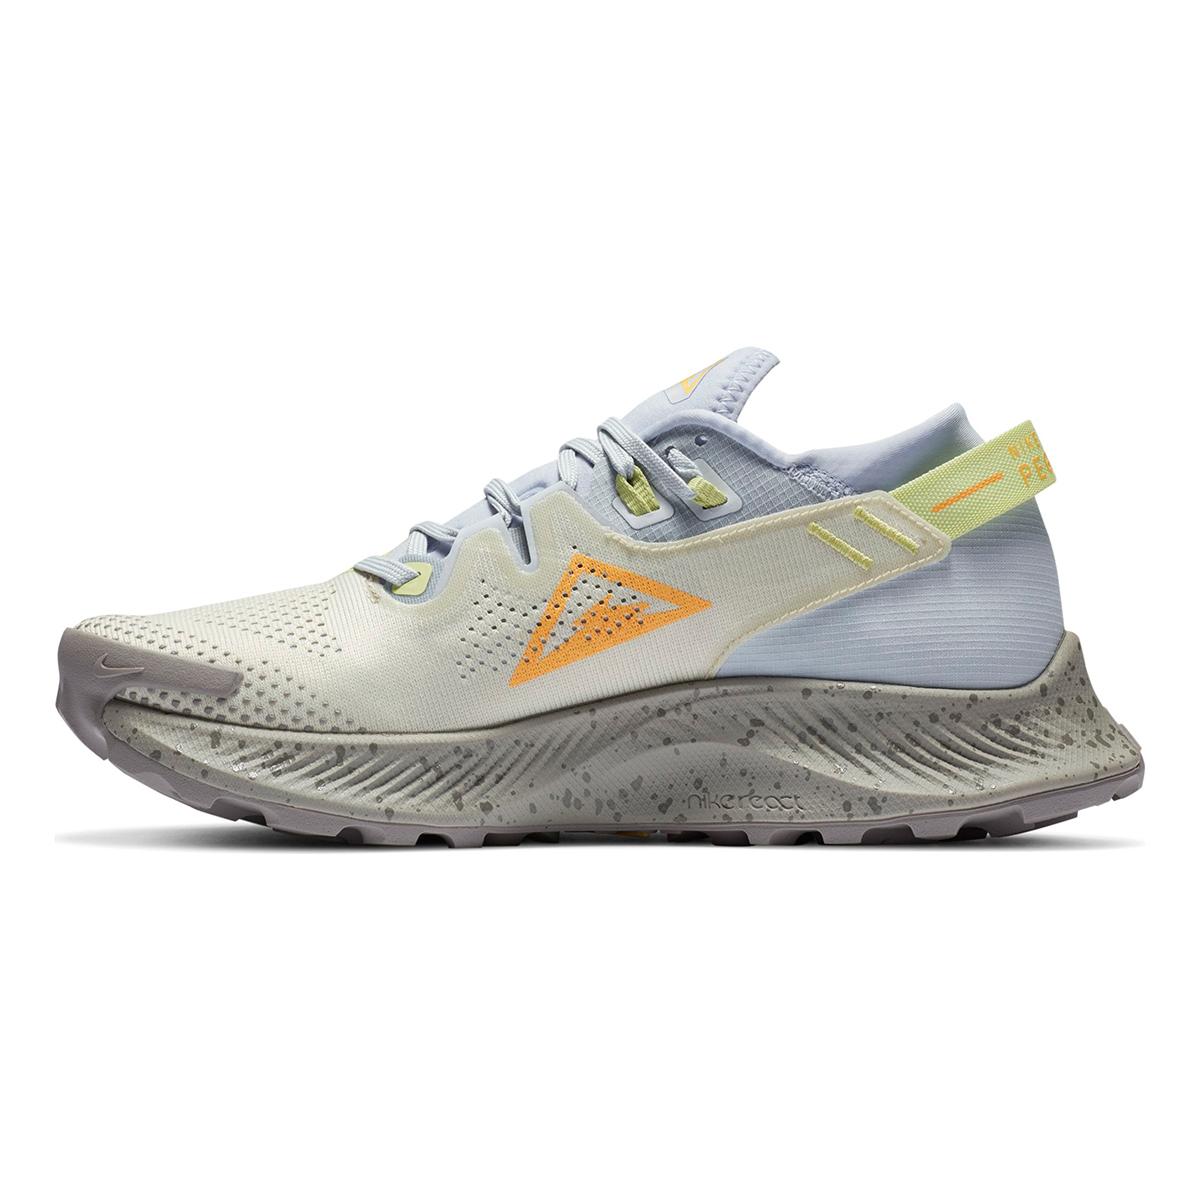 Women's Nike Pegasus Trail 2 Trail Running Shoe - Color: Pure Platinum/Fossil/Limelight/Laser Orange - Size: 5 - Width: Regular, Pure Platinum/Fossil/Limelight/Laser Orange, large, image 4